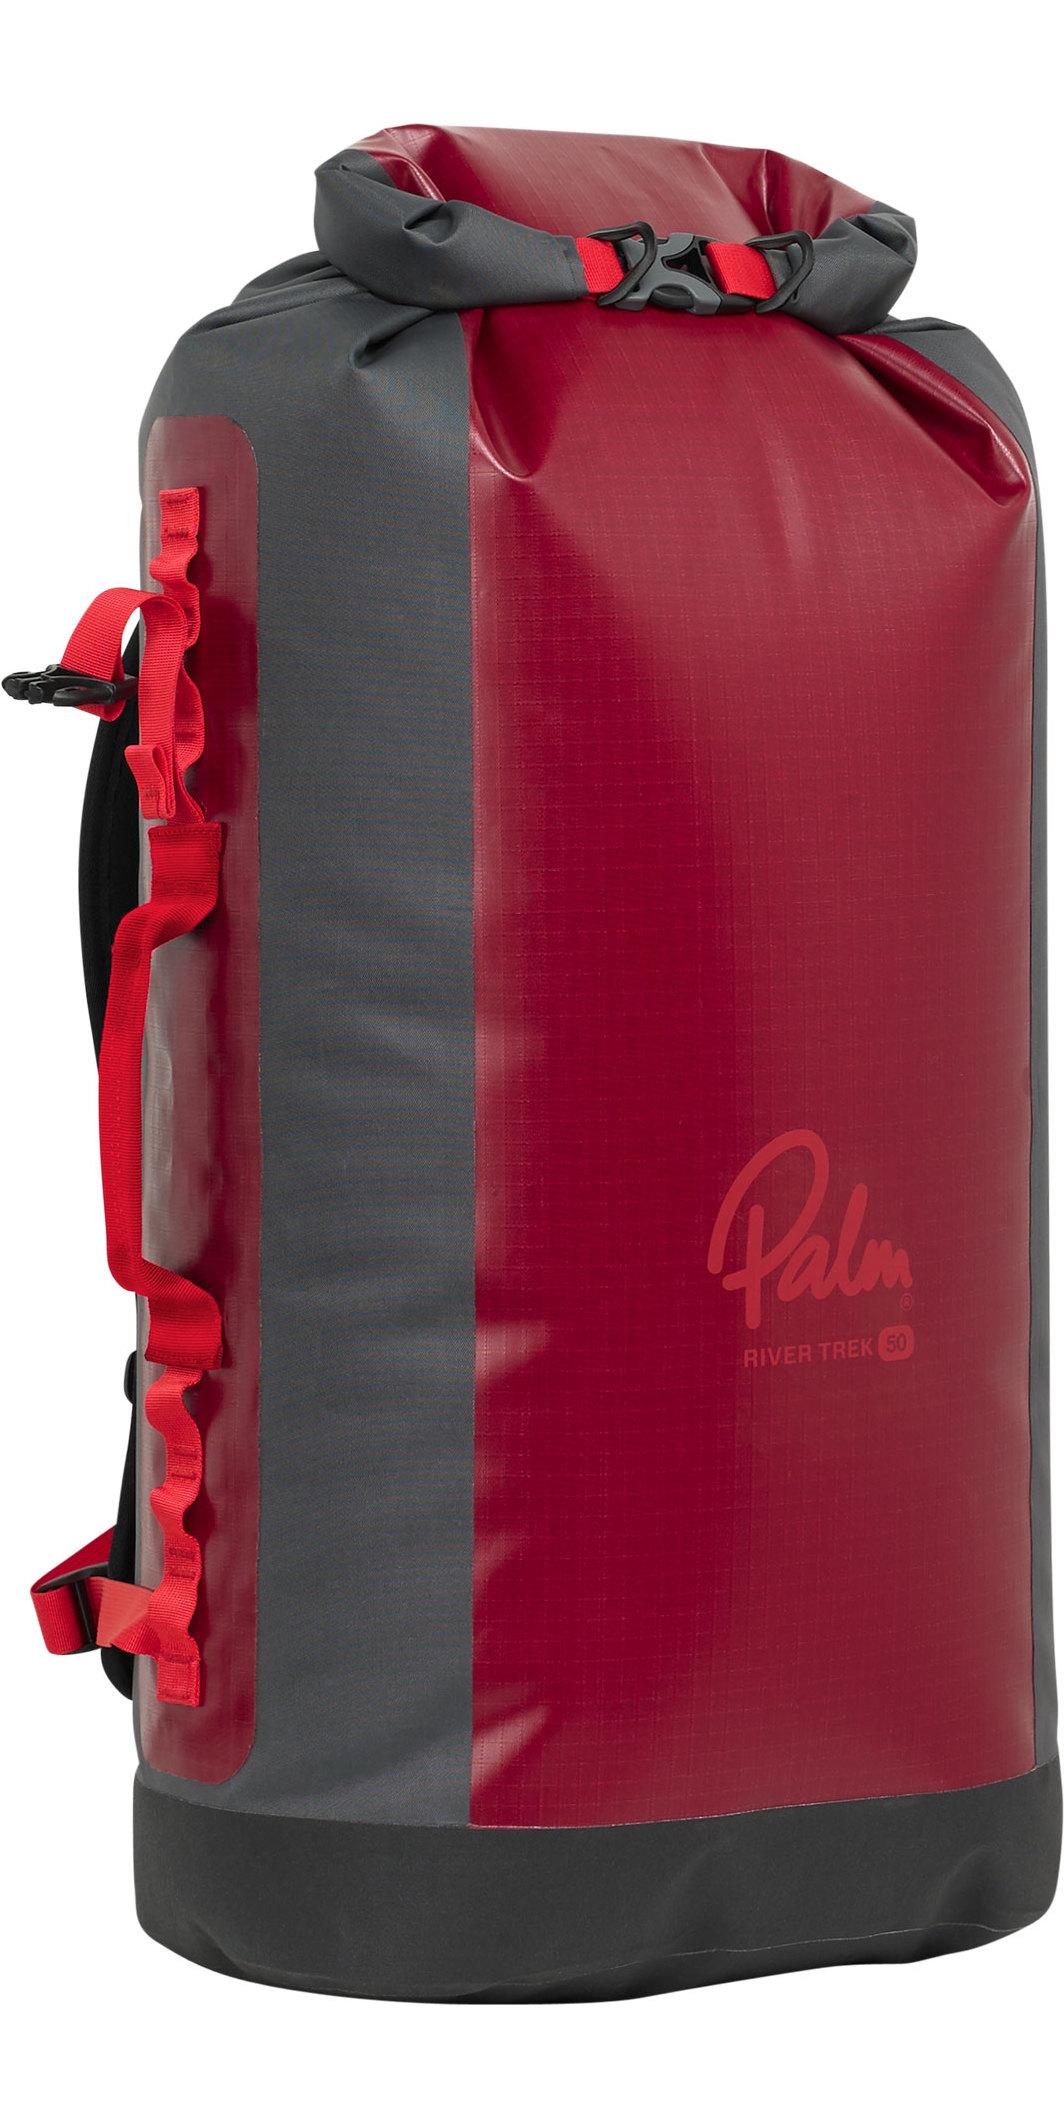 vodotěsný batoh Palm-River-Trek-50L-Dry-Back-Pack-12348---Chilli-Jet-Grey.jpg